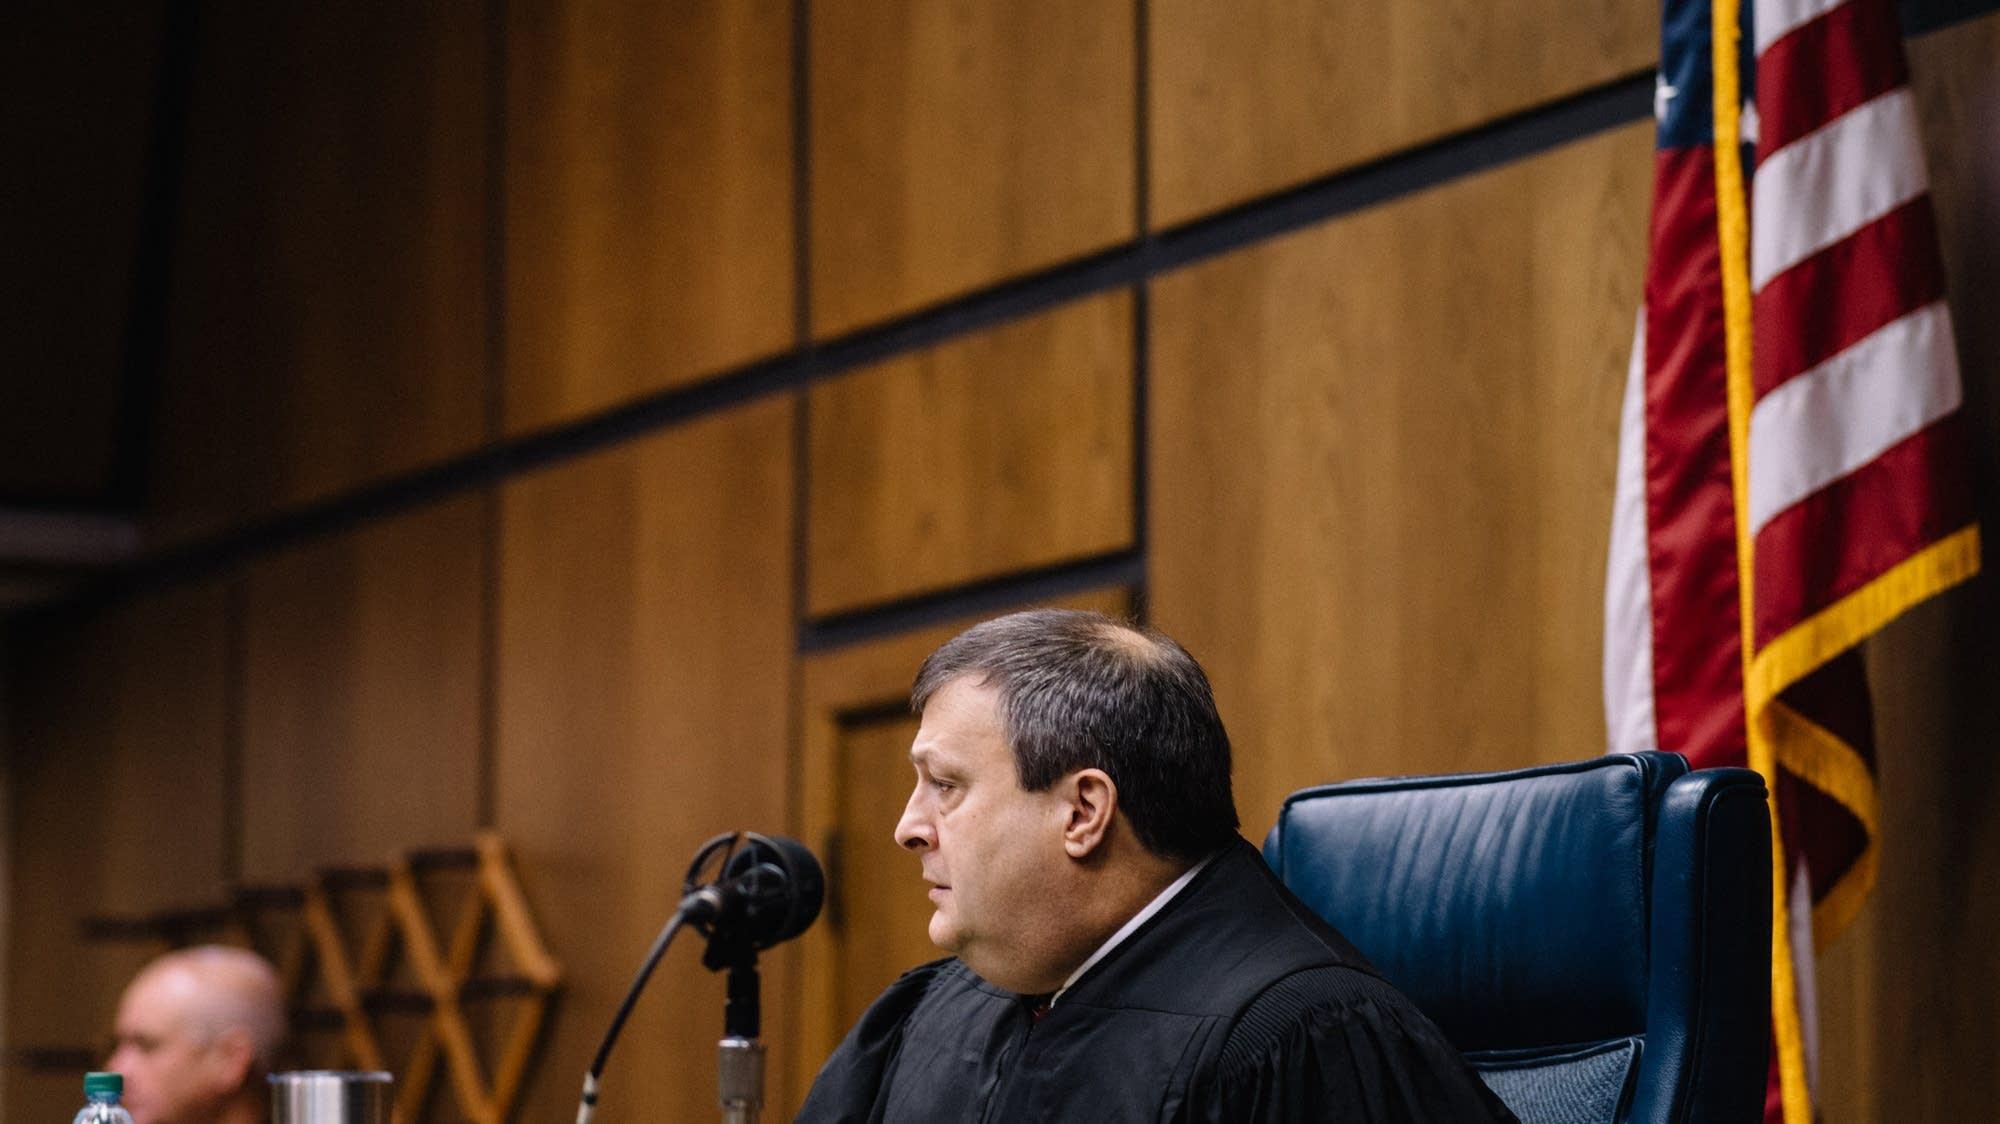 Judge Joey Loper